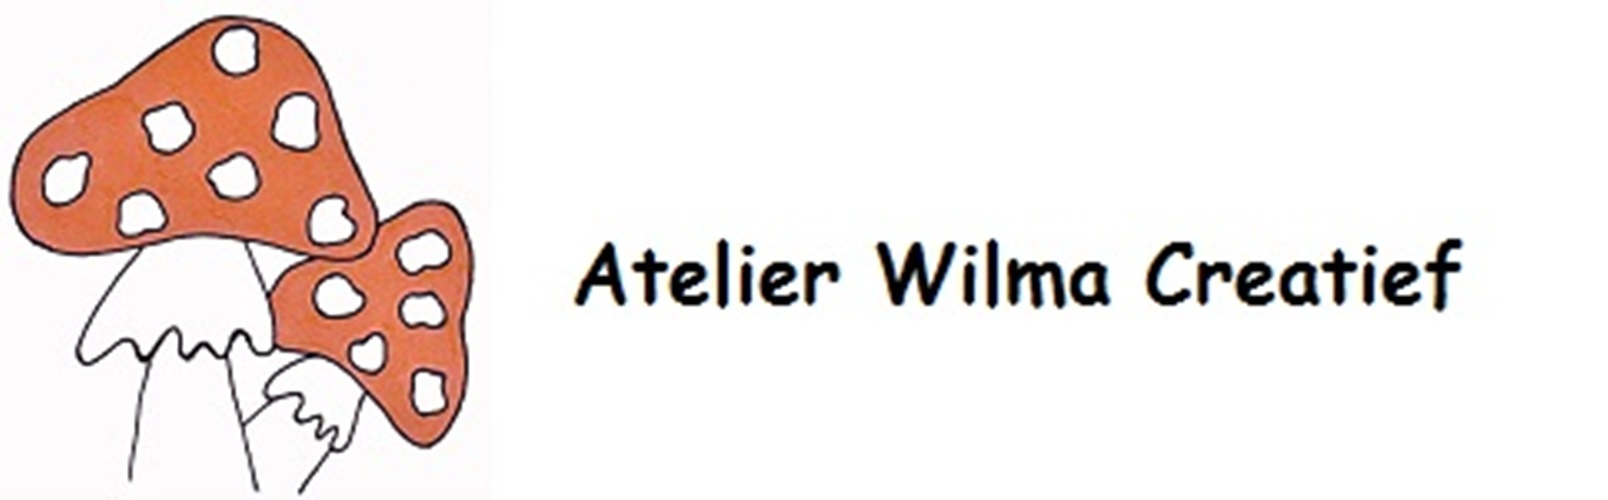 logowebsite Atelier Ailma Creatief